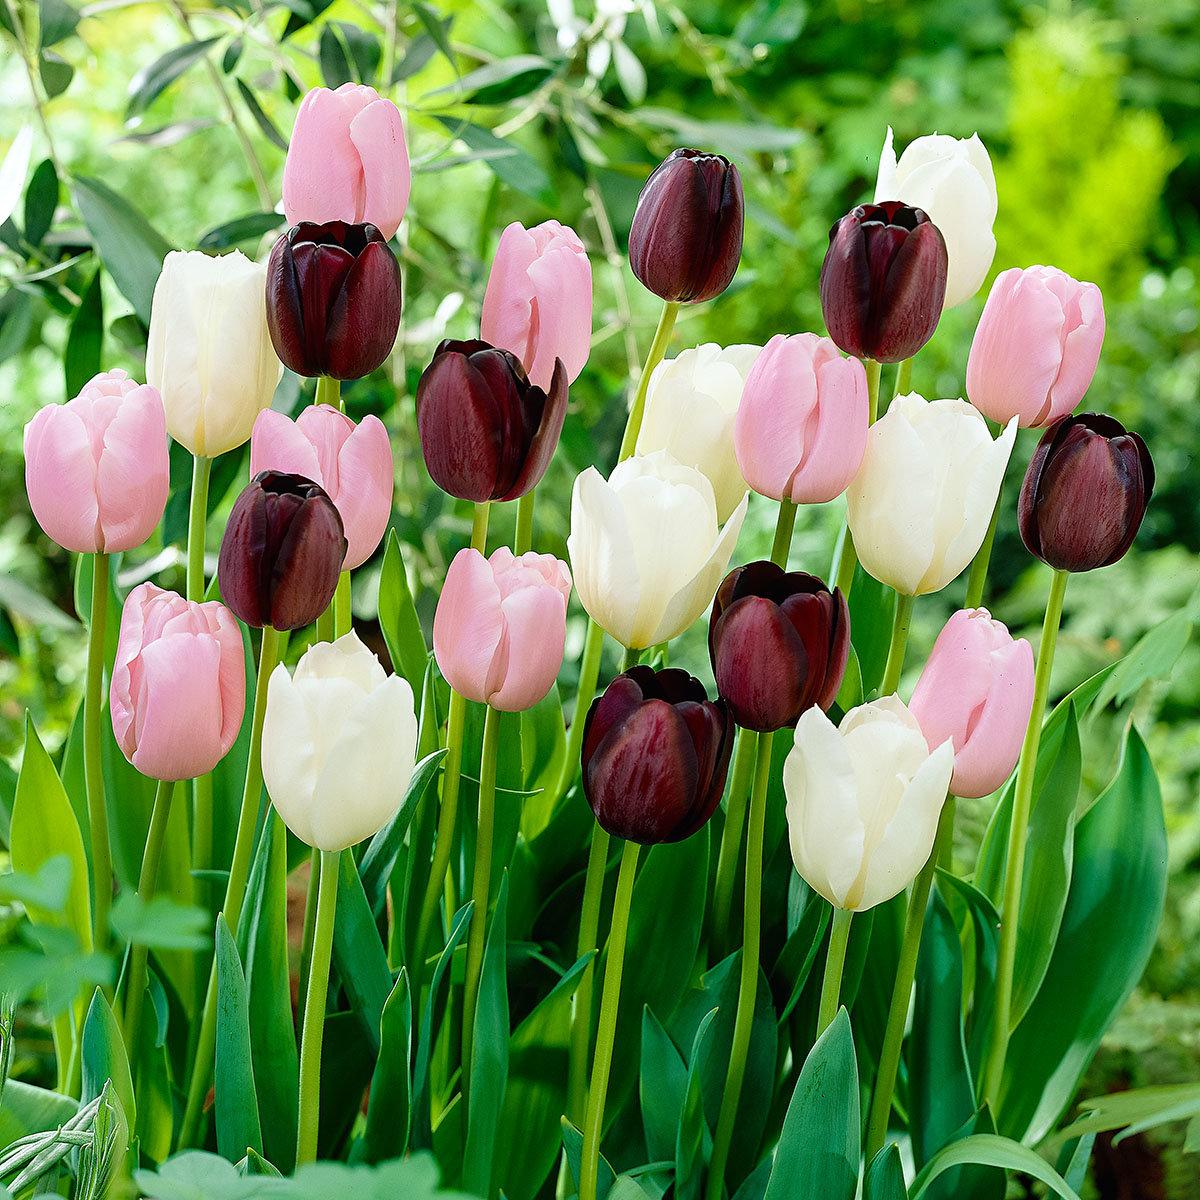 tulpen mischung mai tulpen online kaufen bei g rtner p tschke. Black Bedroom Furniture Sets. Home Design Ideas